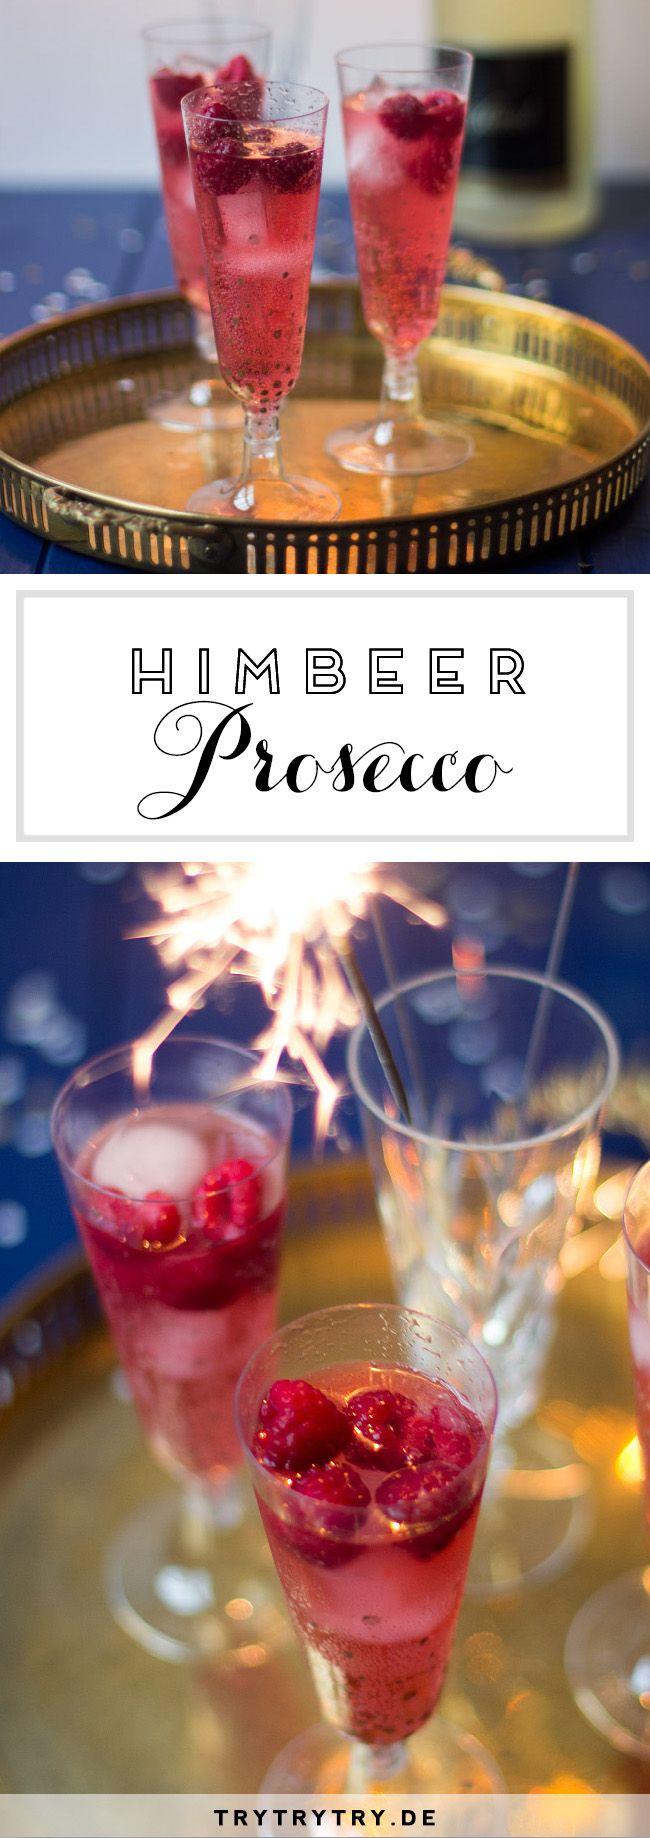 Himbeer Prosecco - perfekt für Silvester!